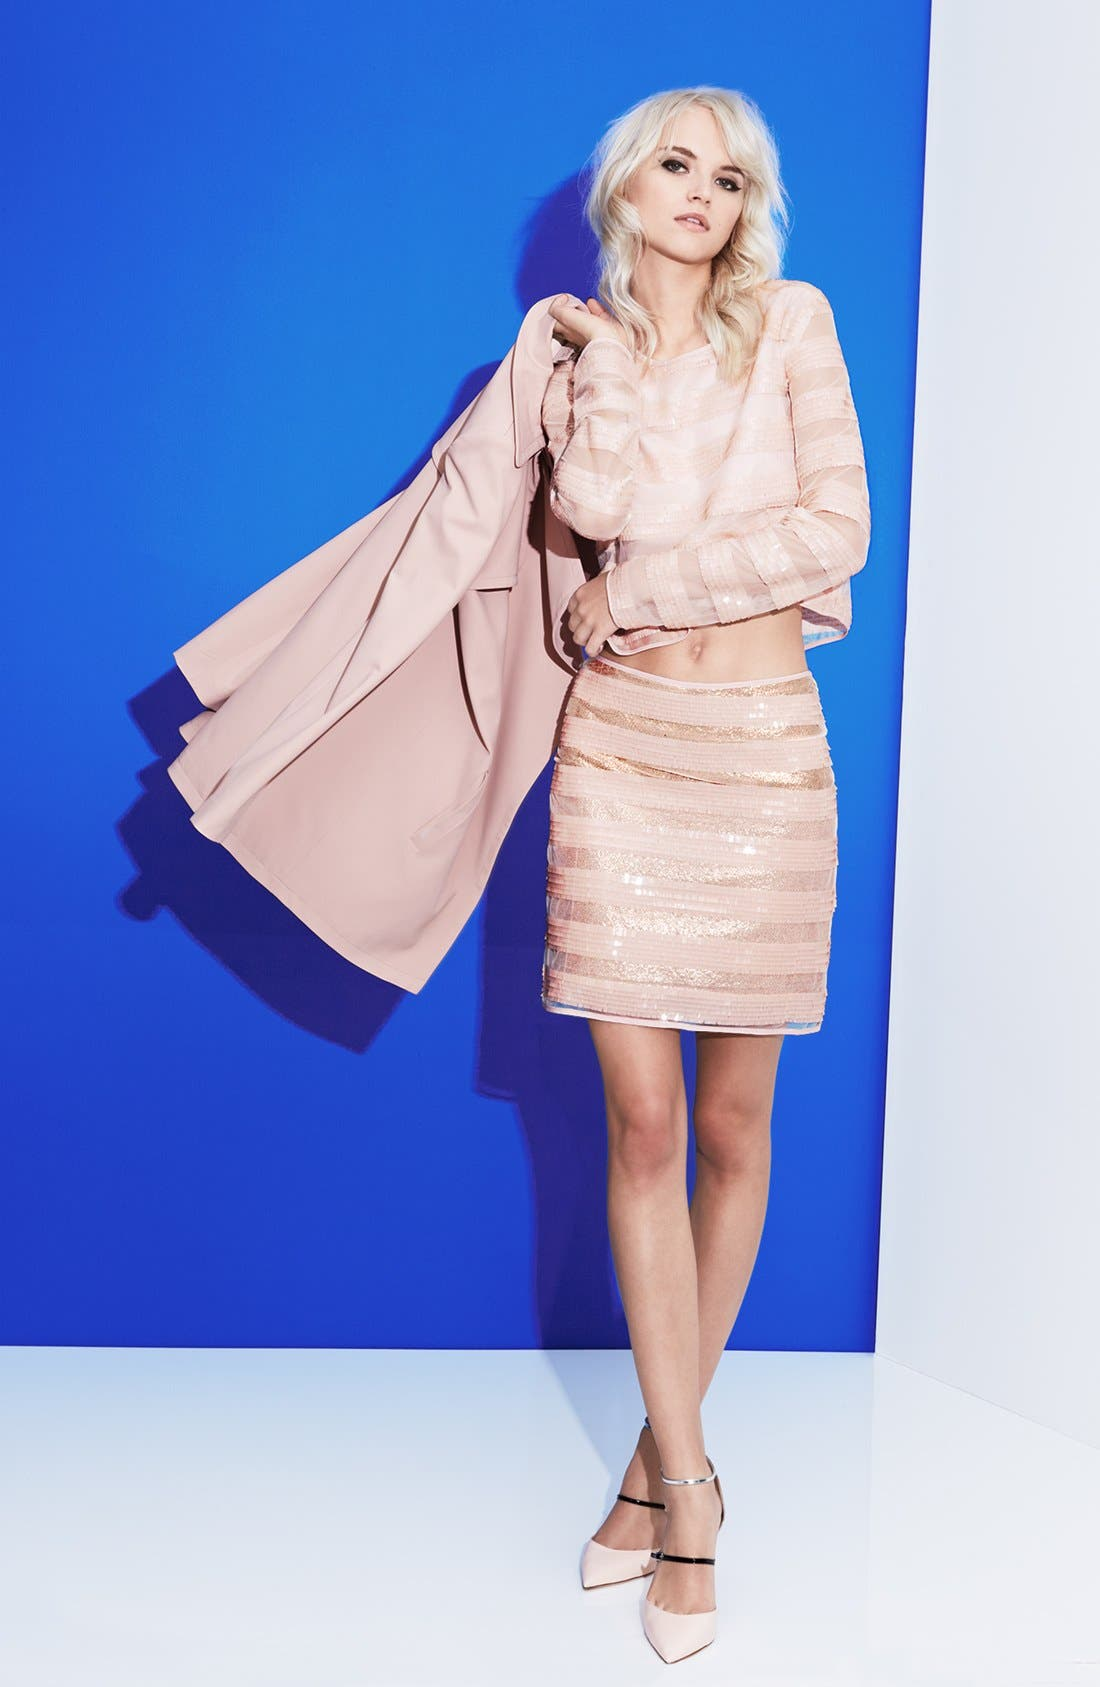 Alternate Image 1 Selected - Mural Trench Coat, MINKPINK Top & Skirt